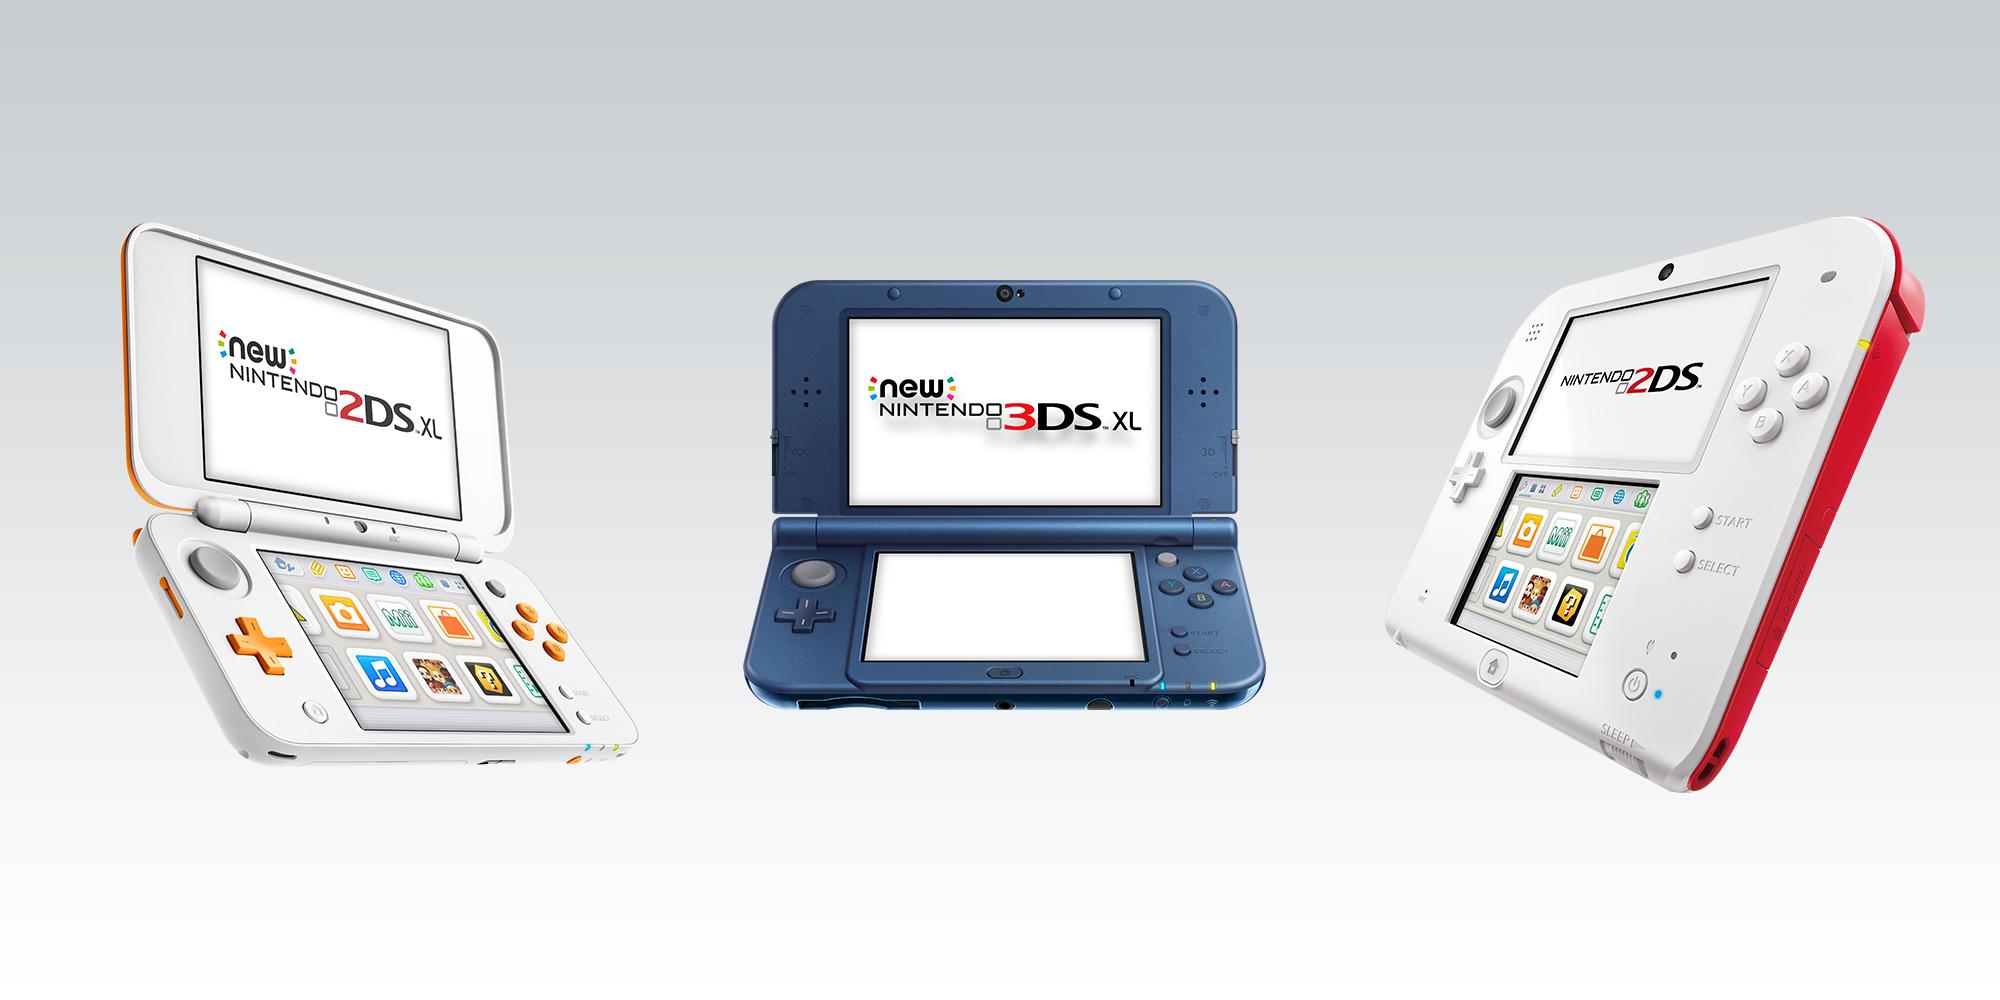 Nintendo 3DS New Releases